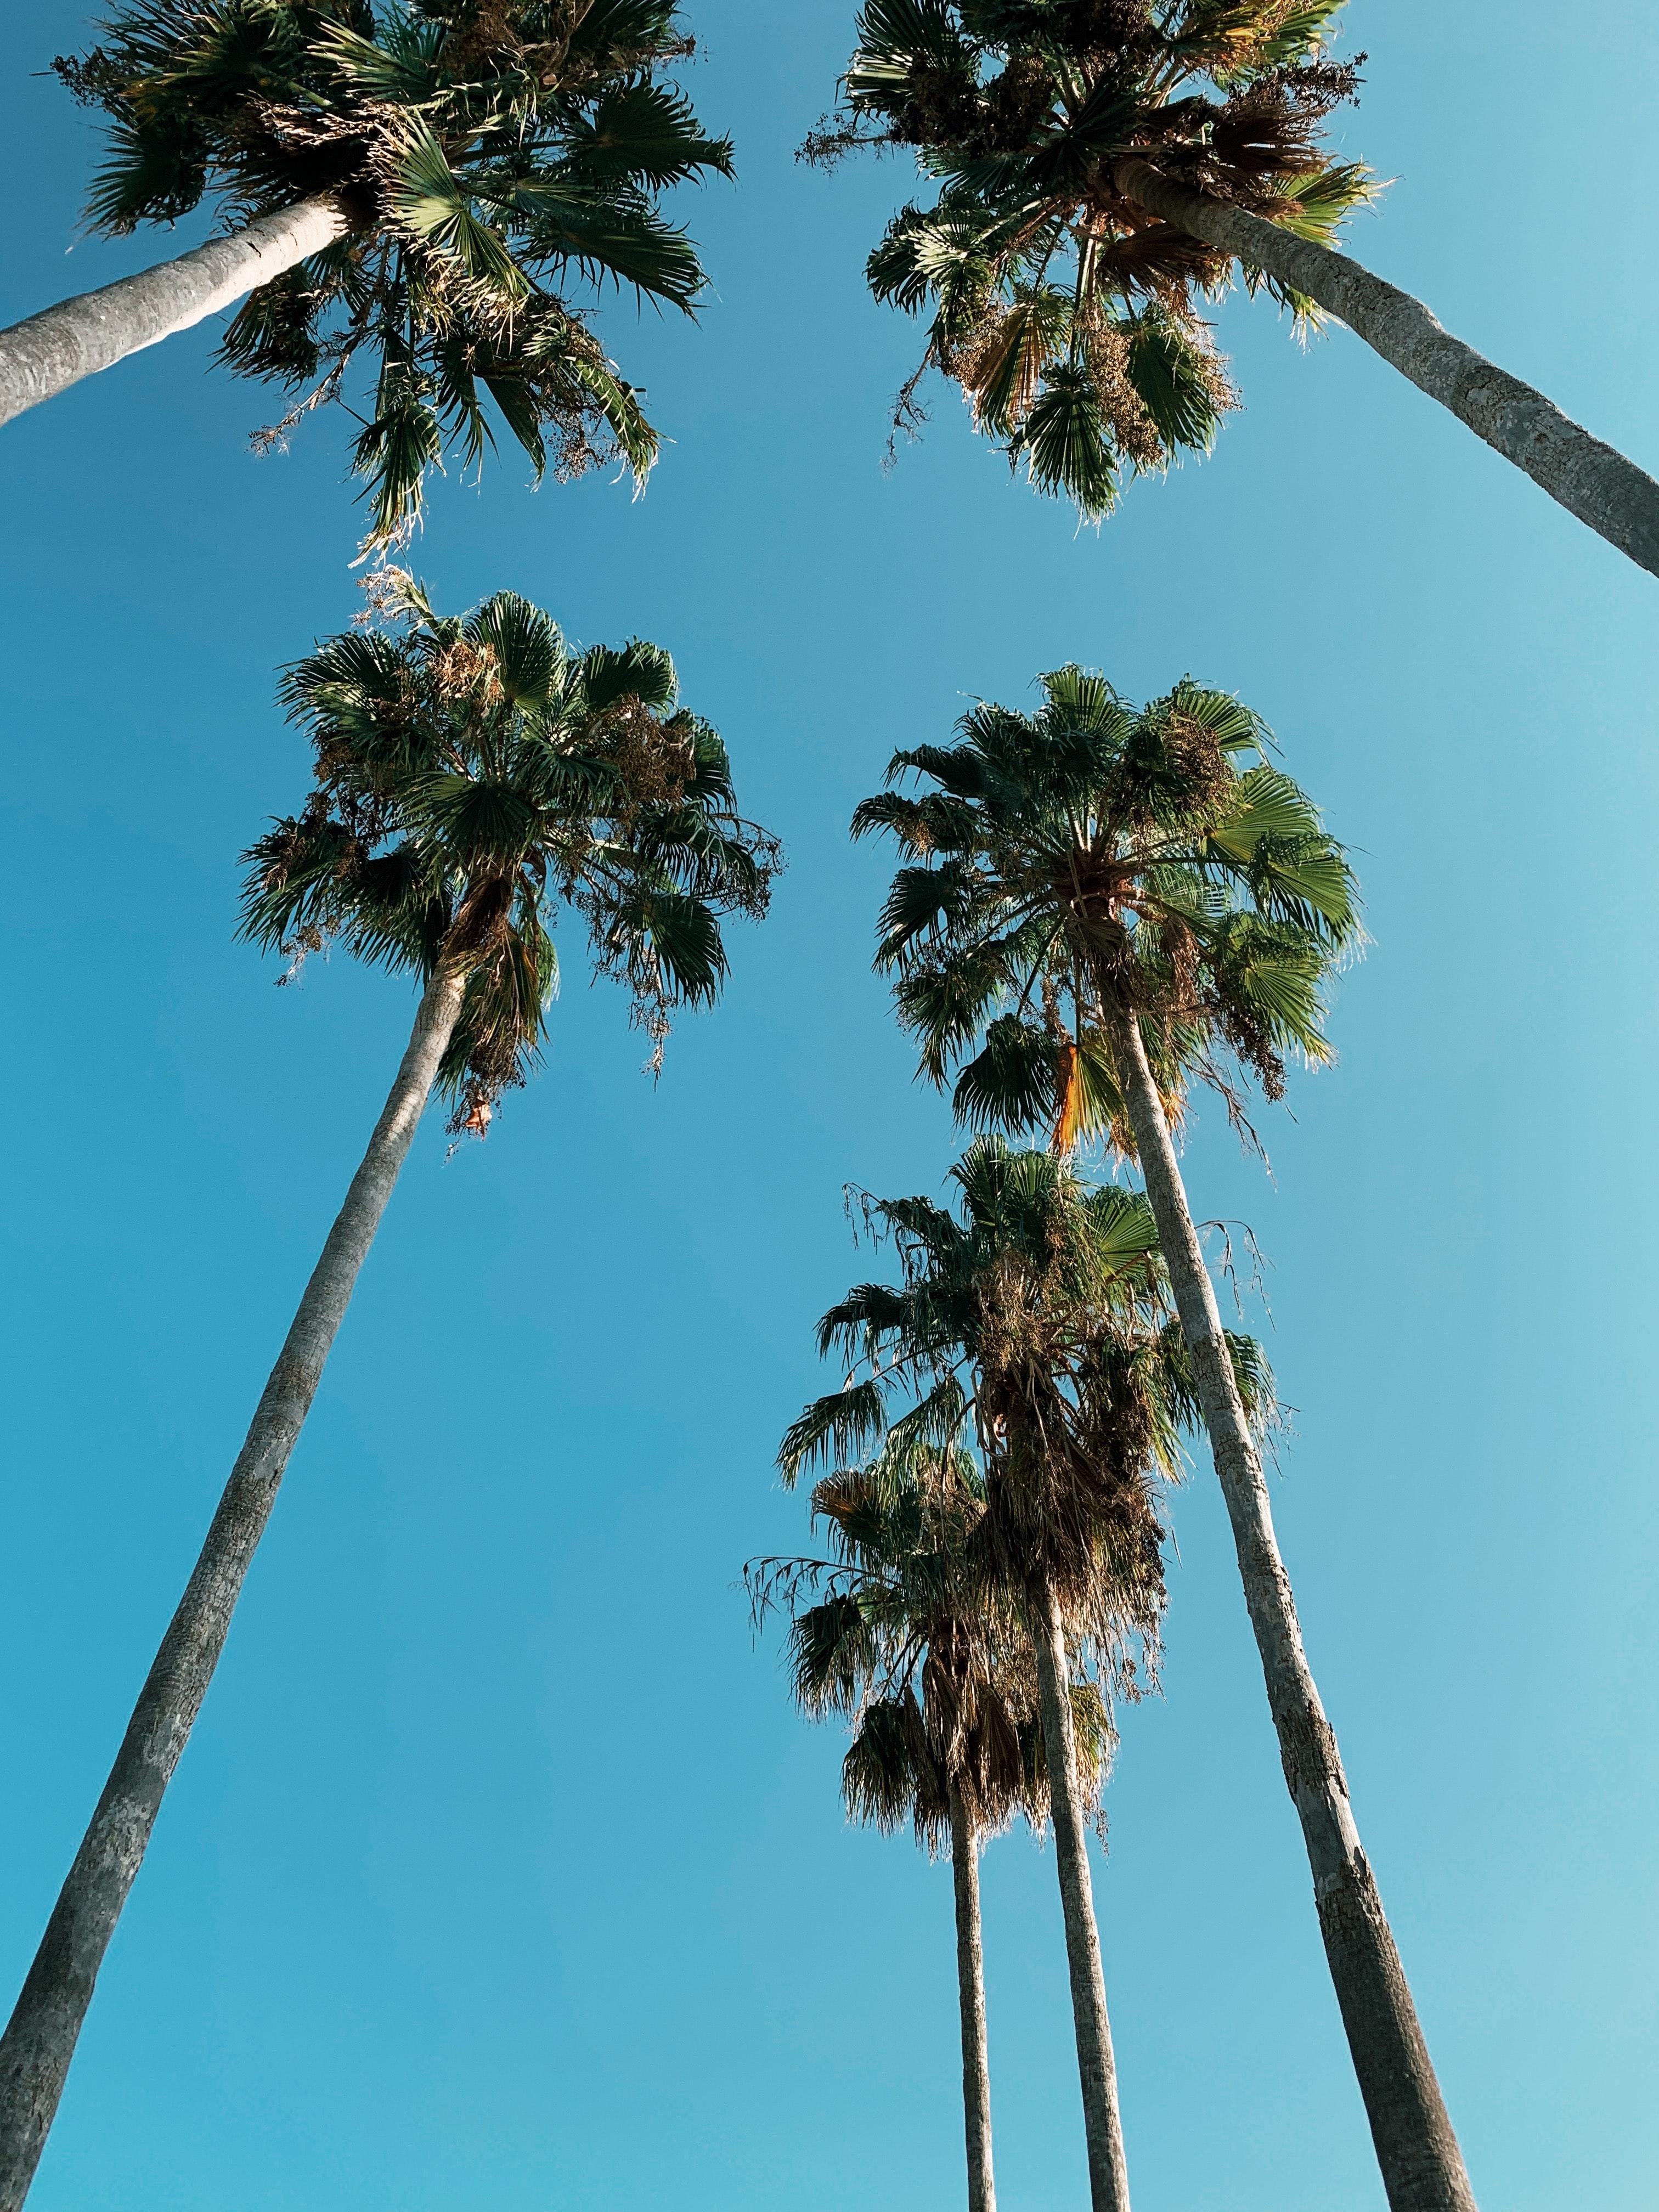 beneath palm trees